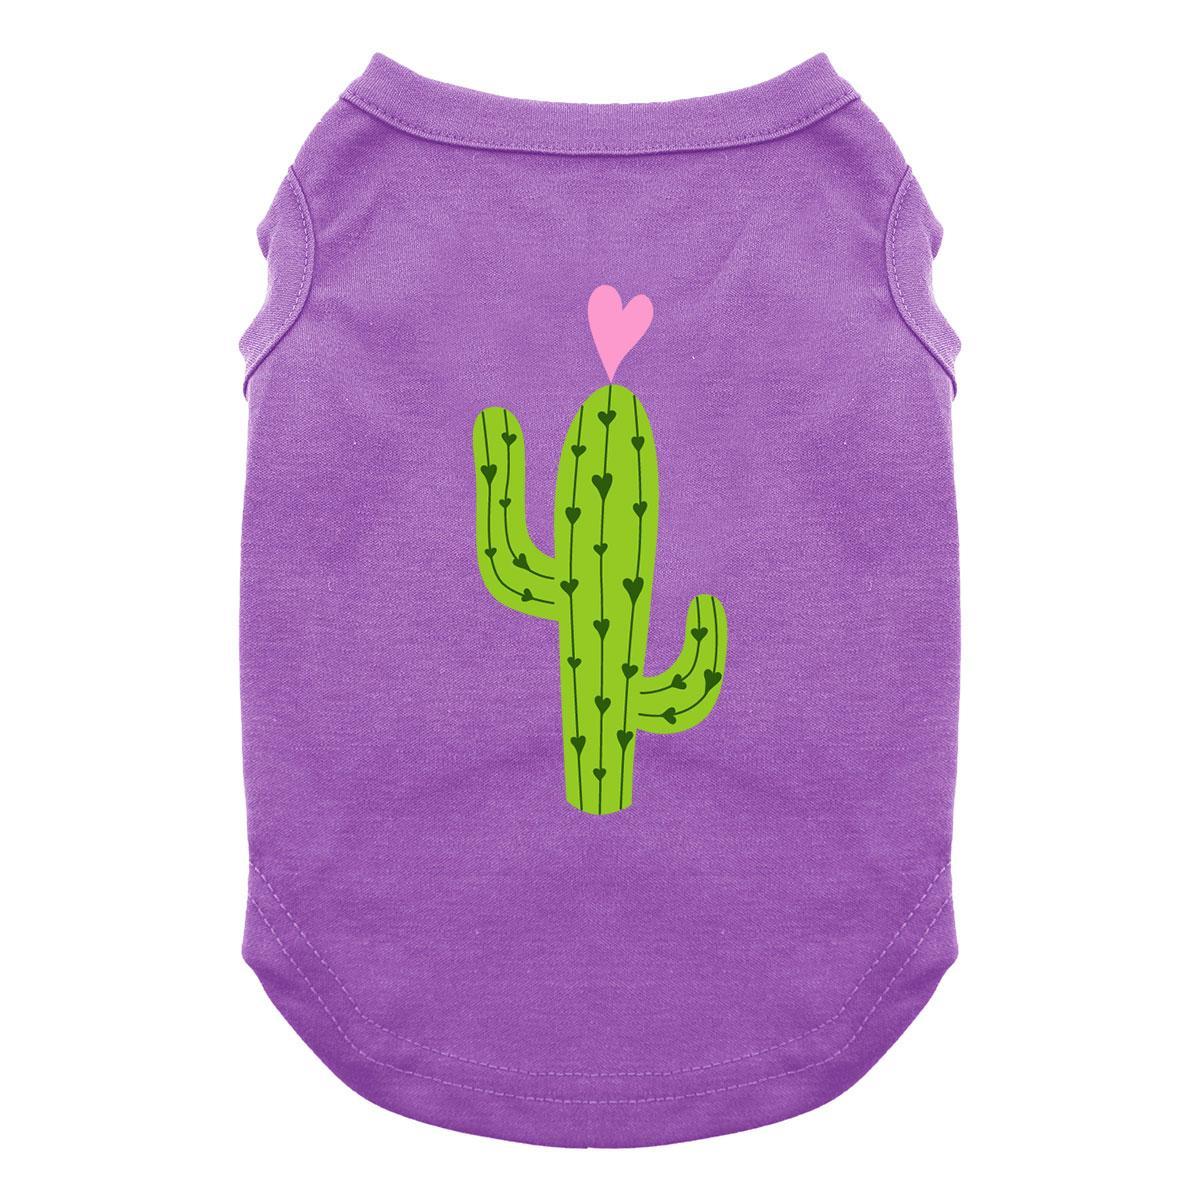 Cactus Dog Shirt - Purple